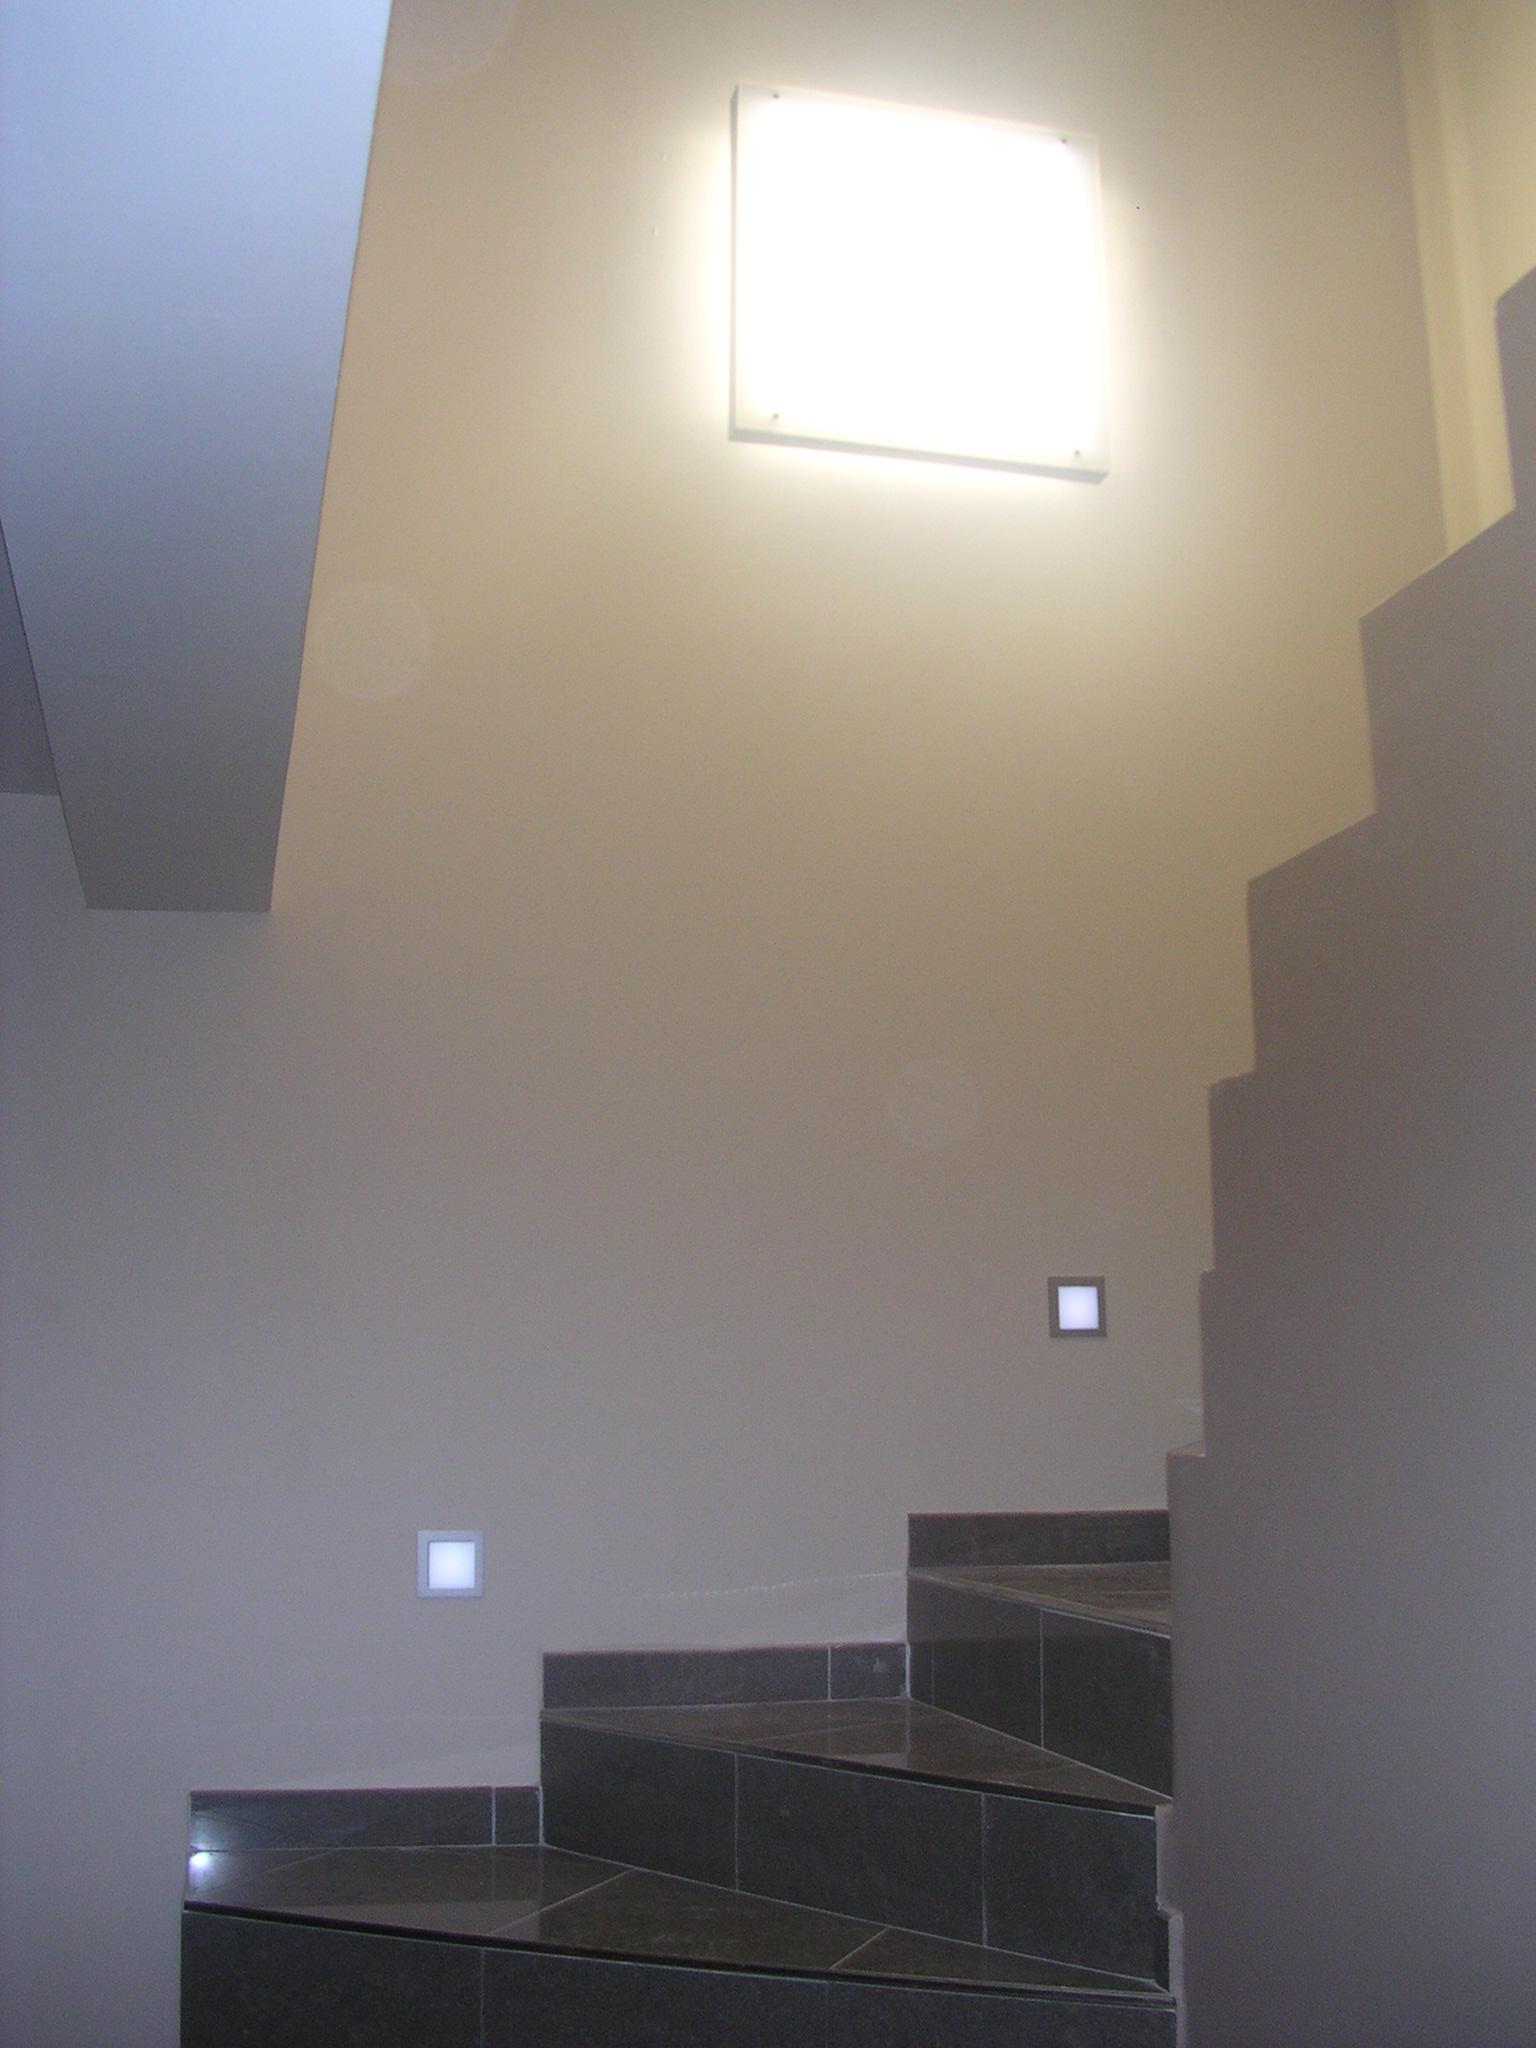 electricien lyon installation depannage electricite renovation eclairage escalier